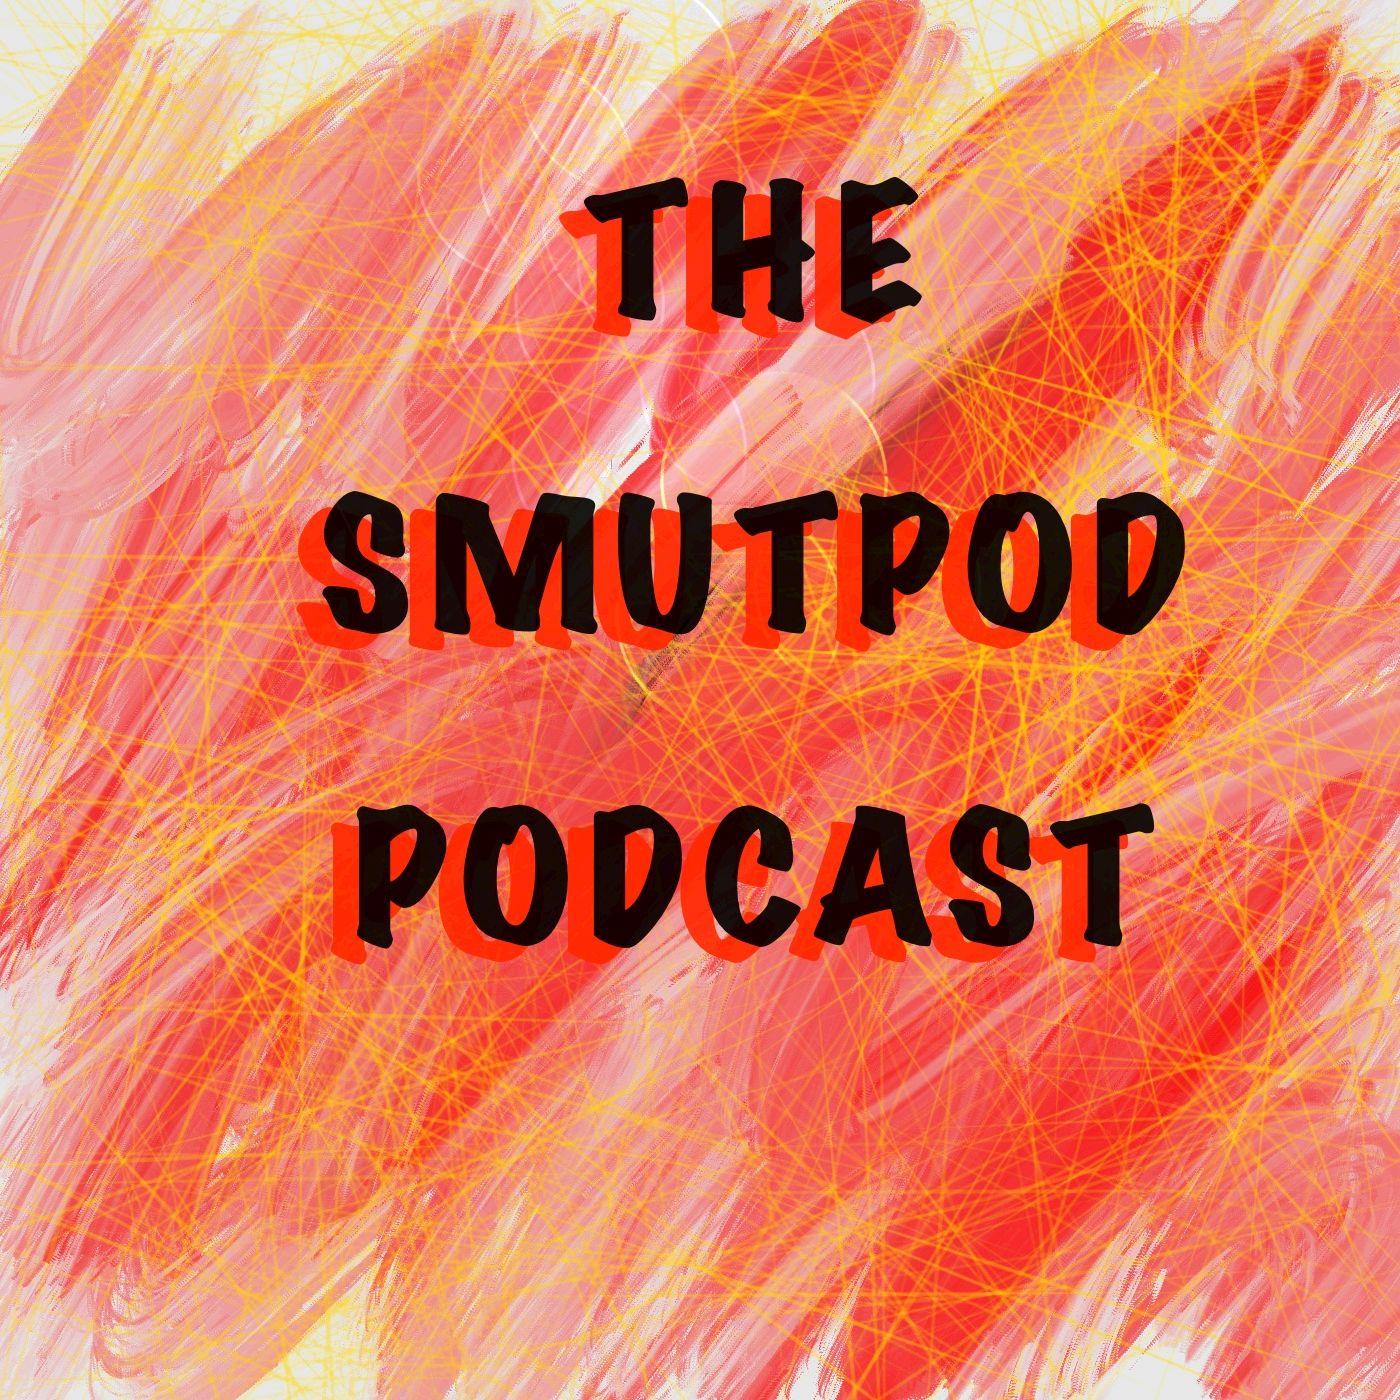 SmutPod's Podcast show art